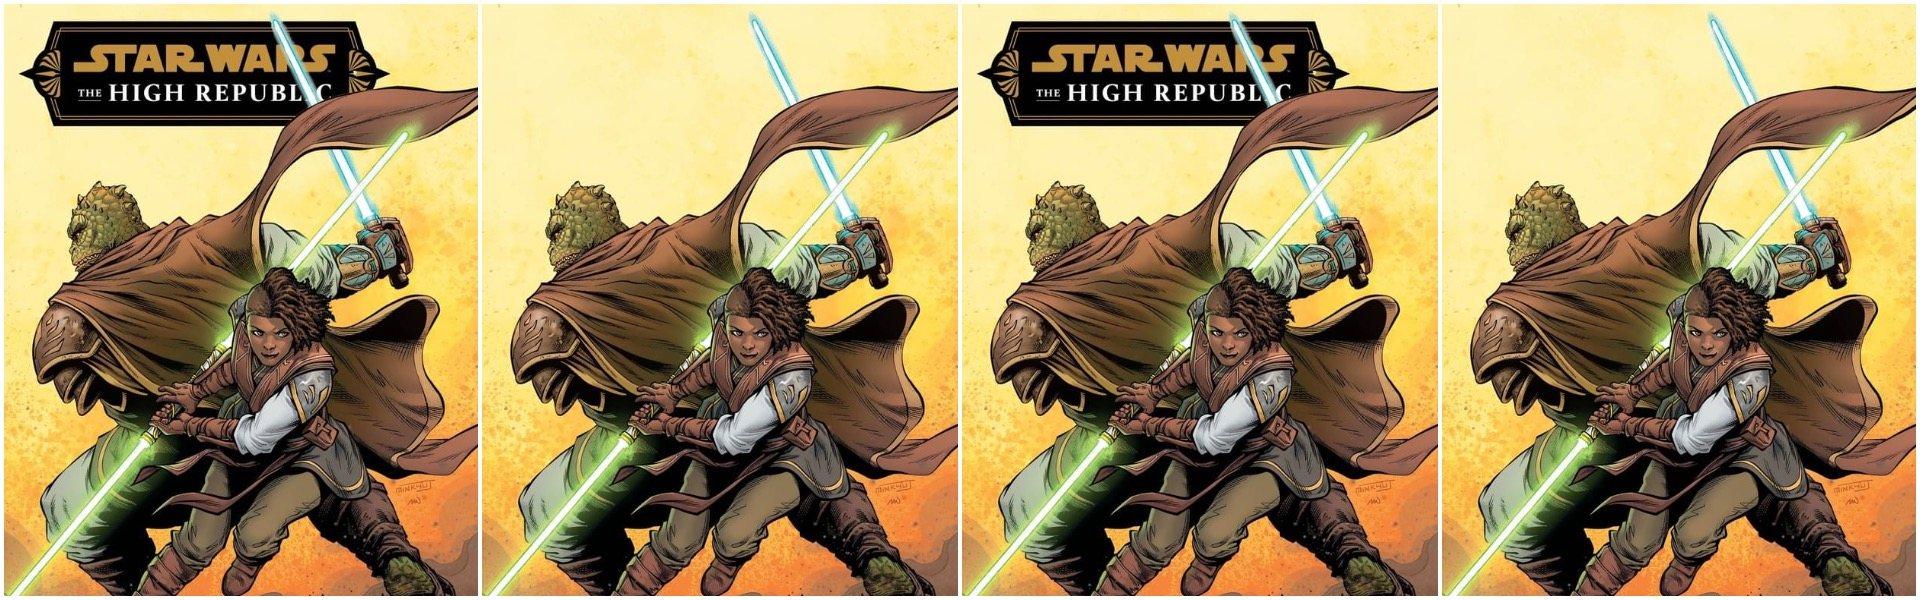 Star Wars High Republic #3 Minkyu Yung Variants